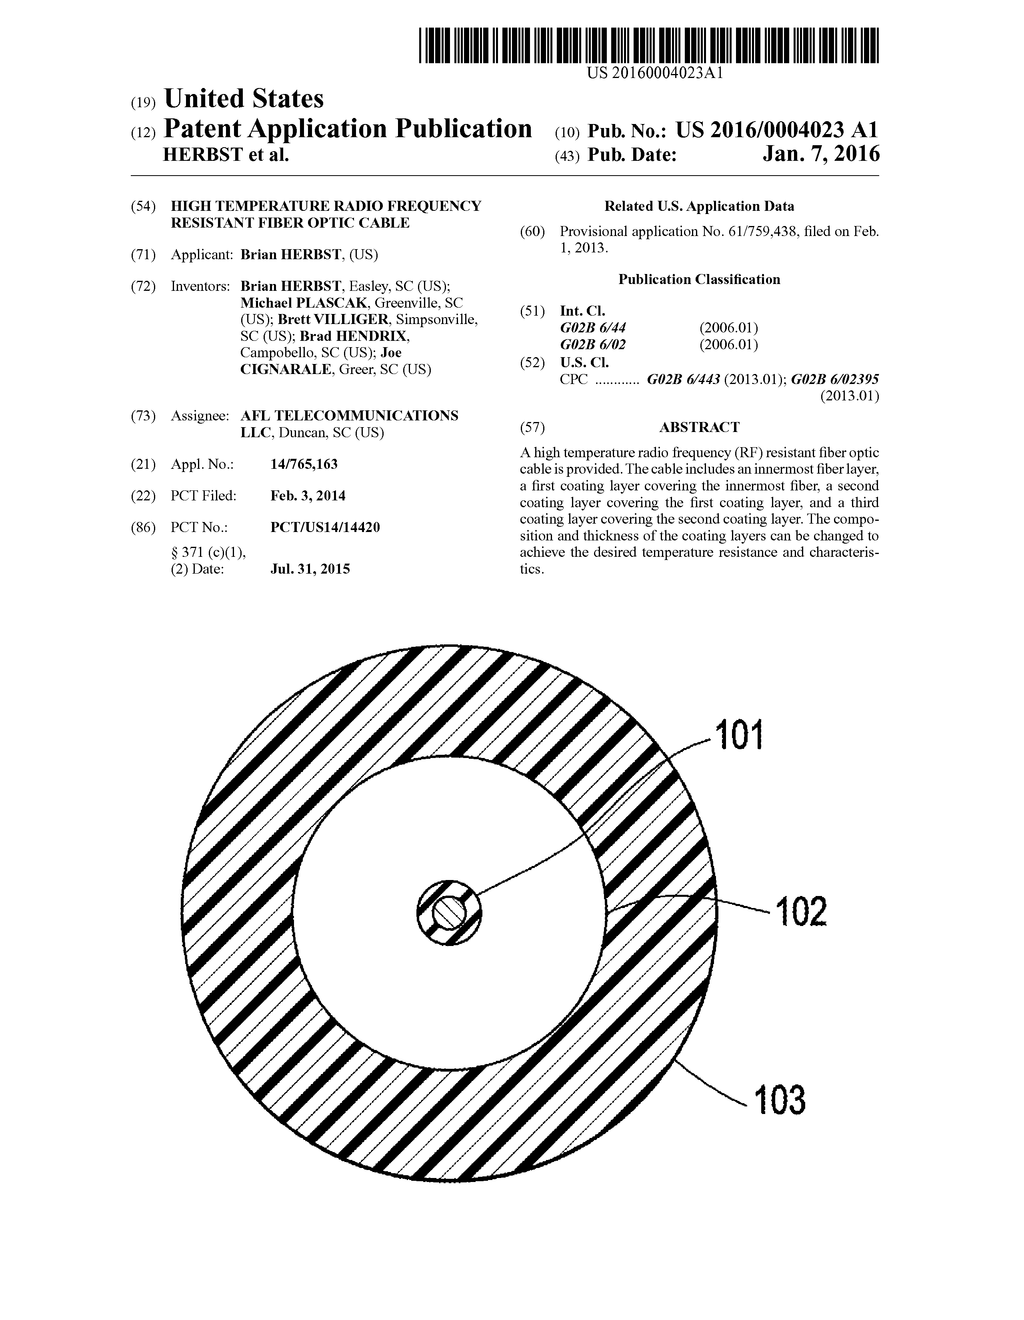 Fiber Optic Cable Diagram Trusted Wiring Diagrams Radiowavesdiagram Radio High Temperature Frequency Resistant Multimode Underground